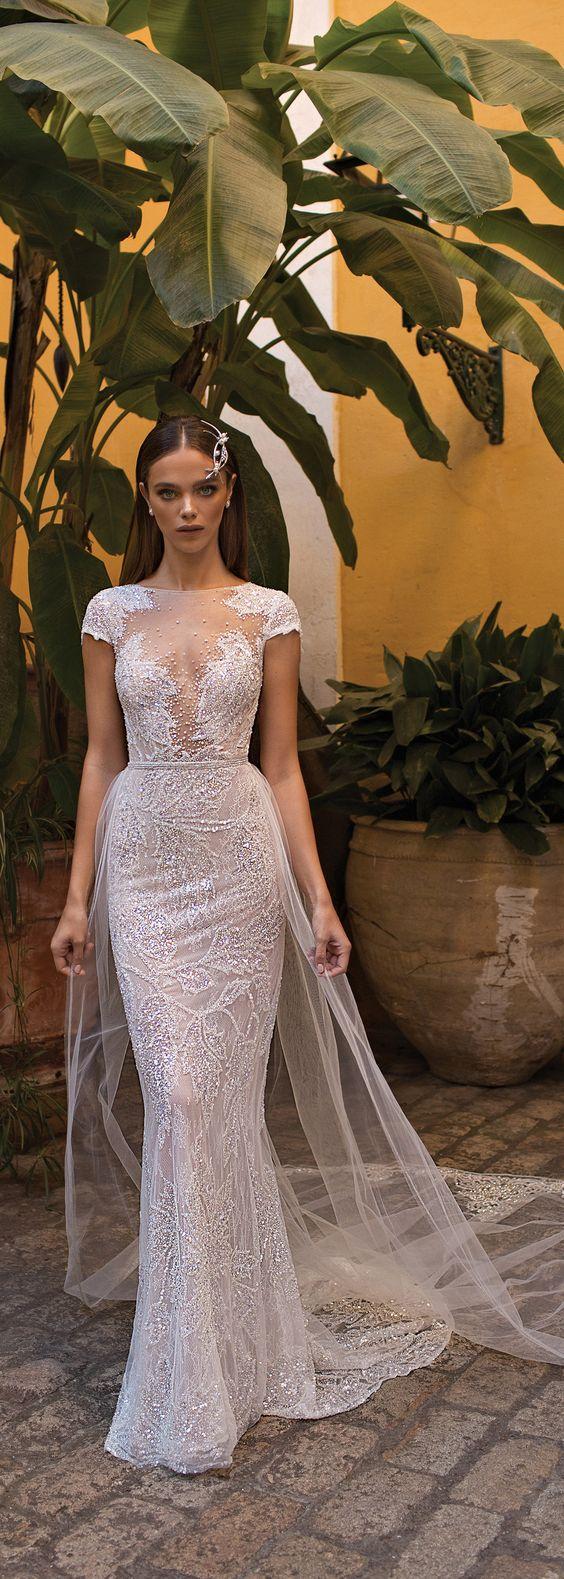 Vestidos de novia para boda civil elegantes